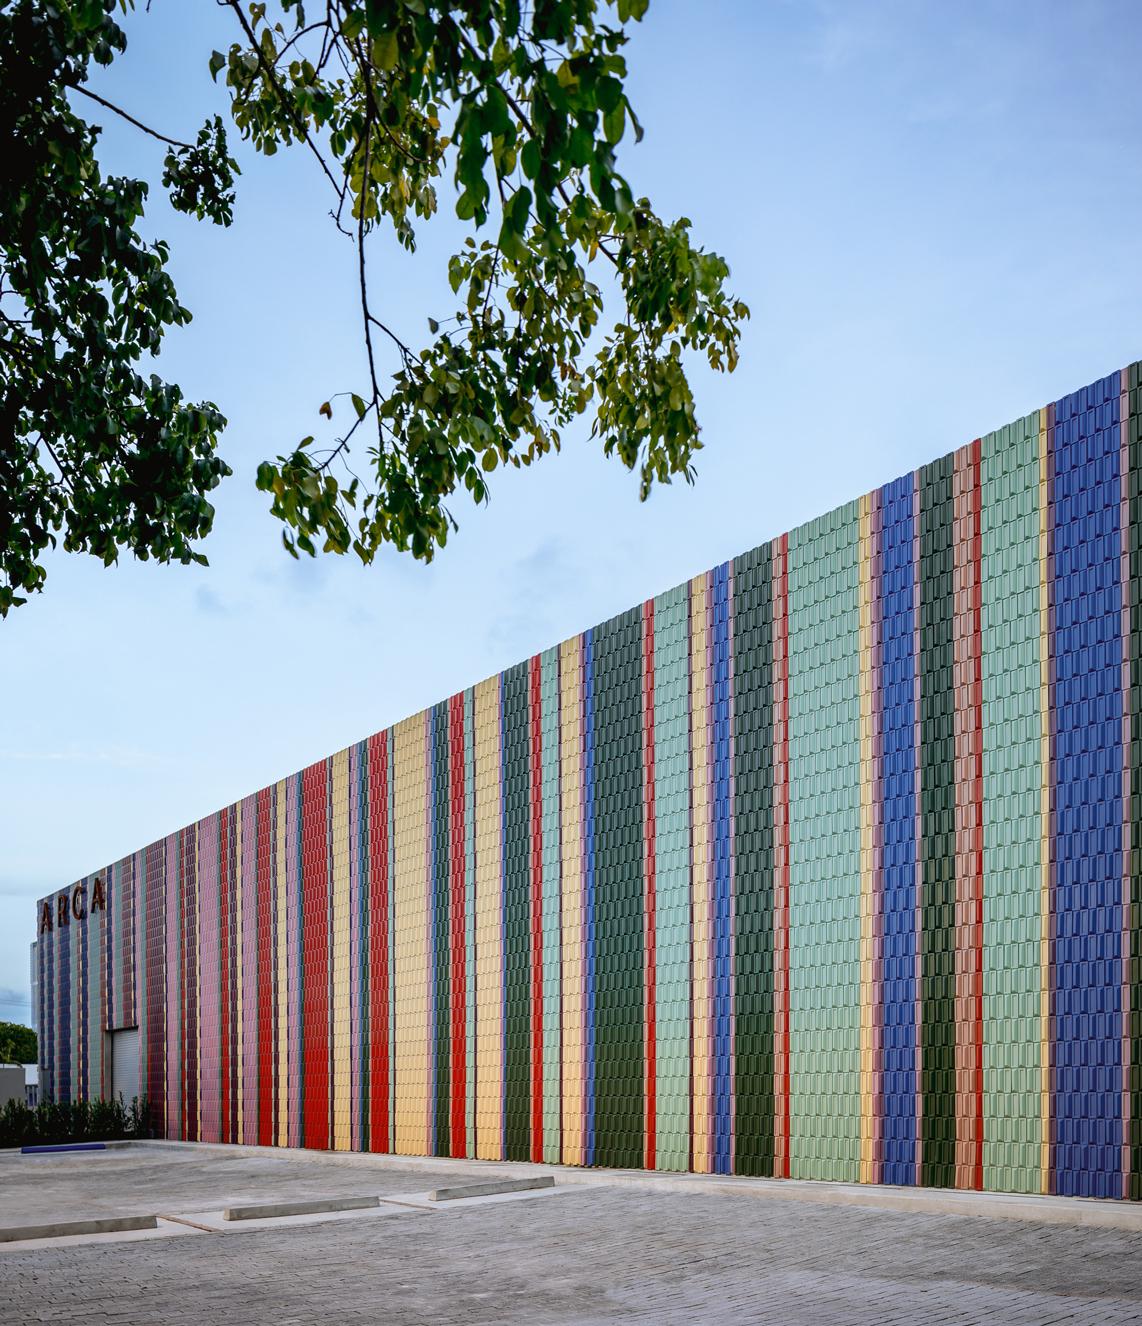 ARCA Wynwood Design Center, Miami, Florida, EUA / 2020